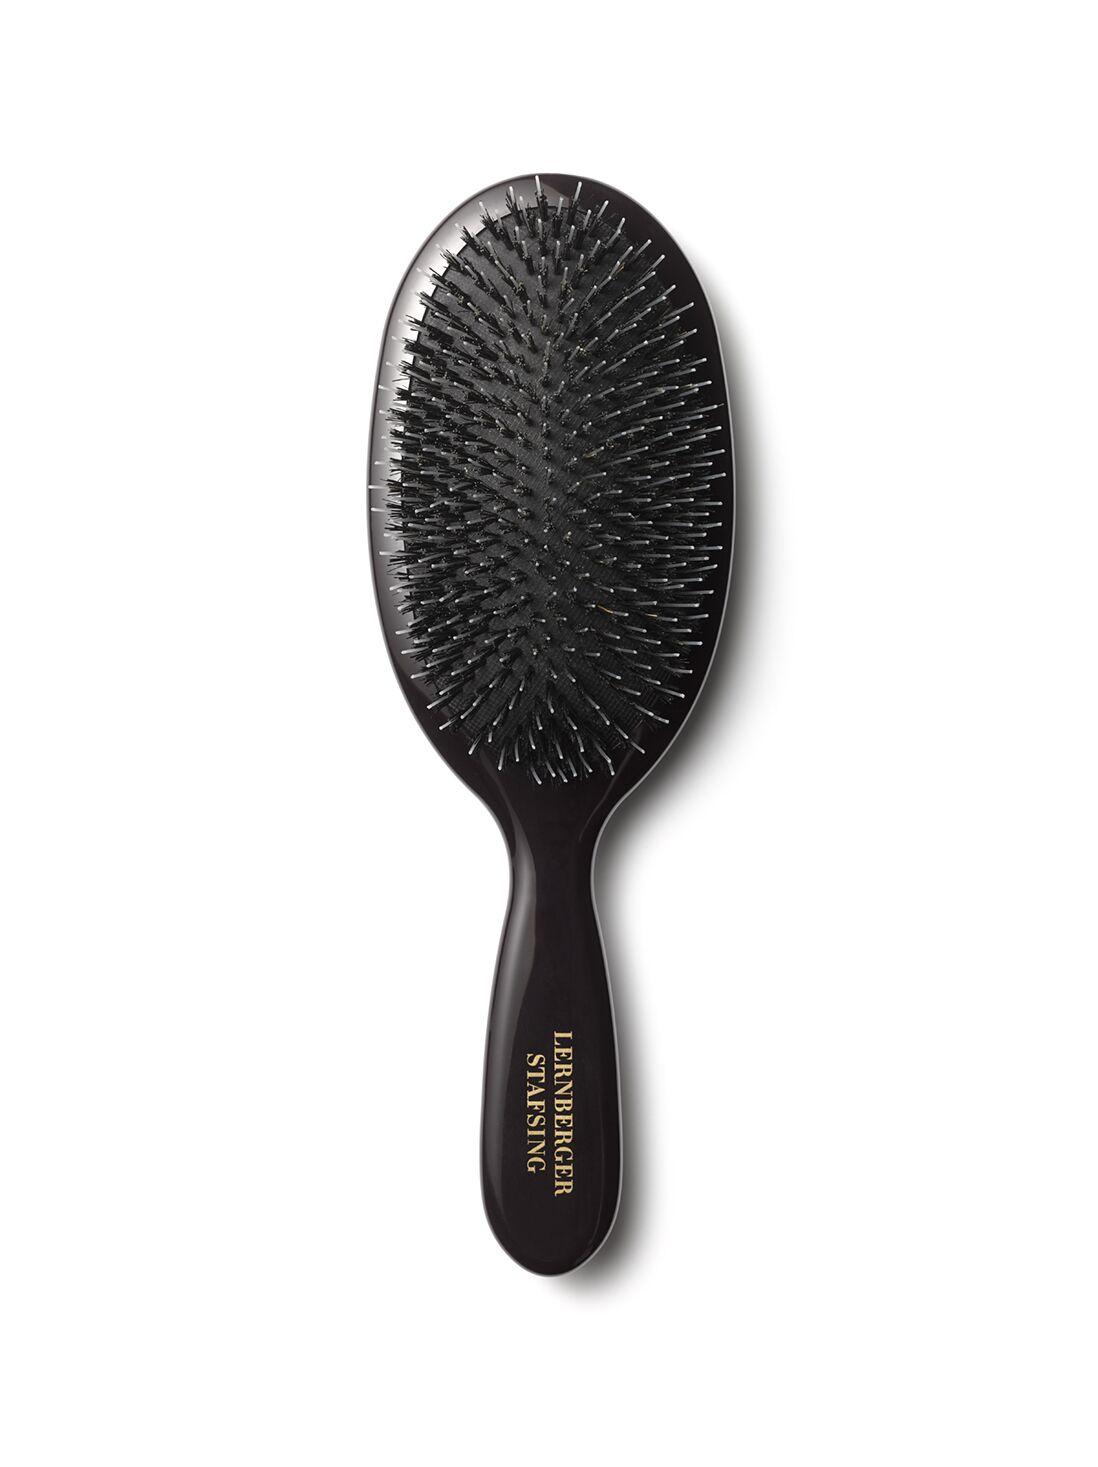 Lernberger Stafsing Dressing Brush, small